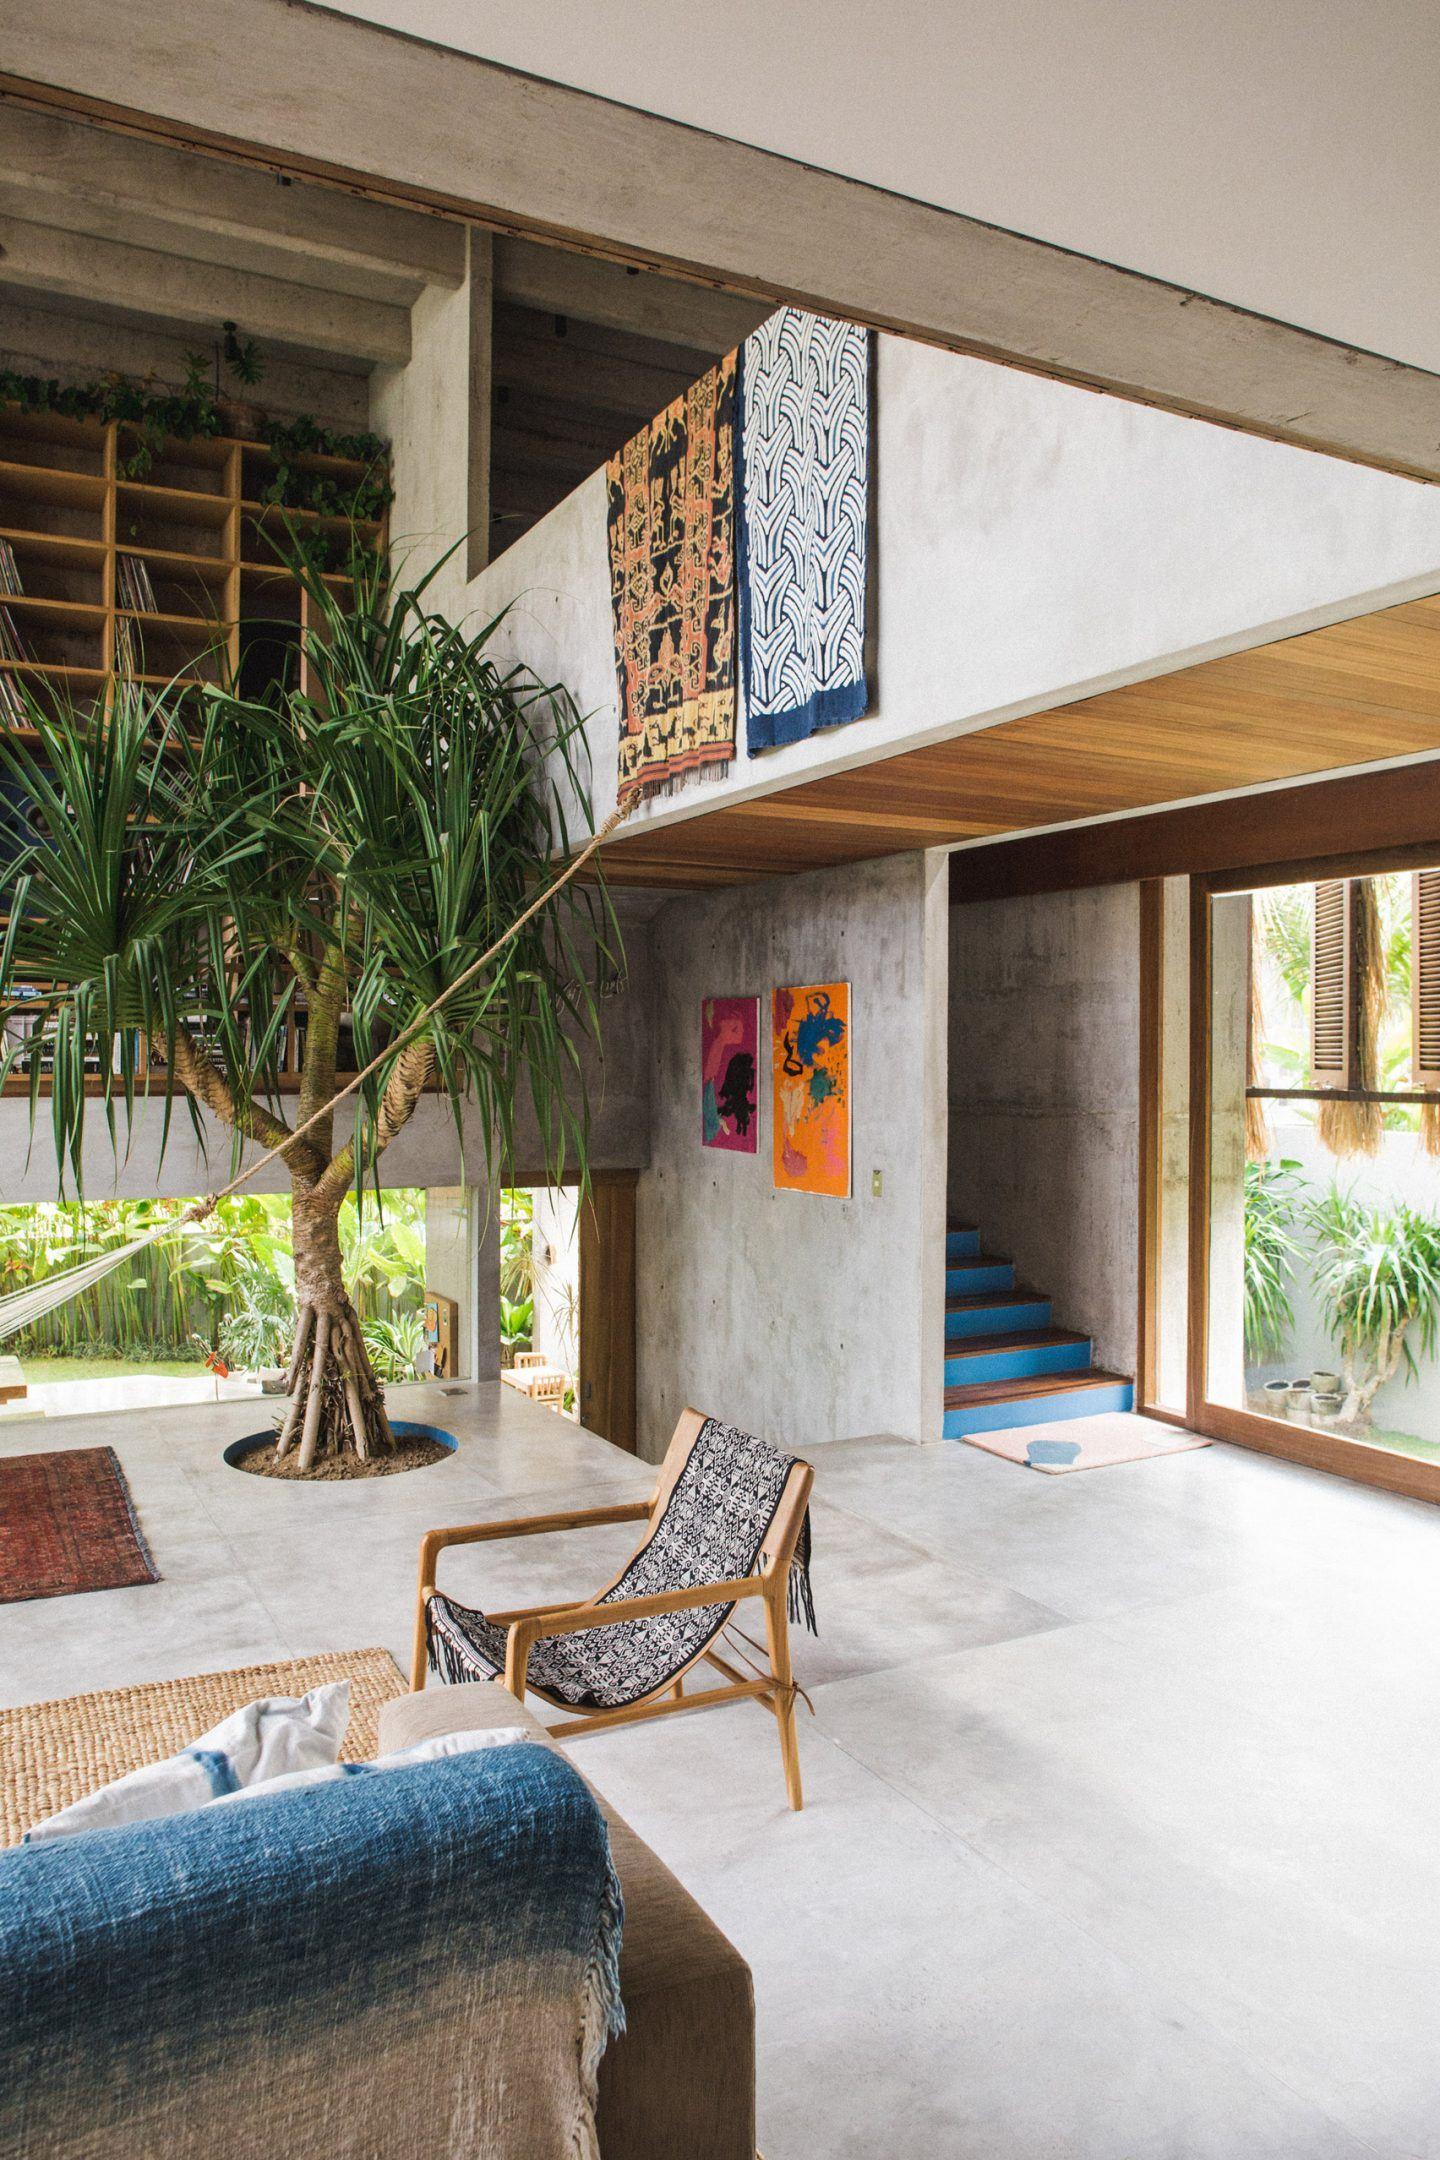 IGNANT-Architecture-Patisandhika-Daniel-Mitchell-Indonesia-Brutalist-Home-16